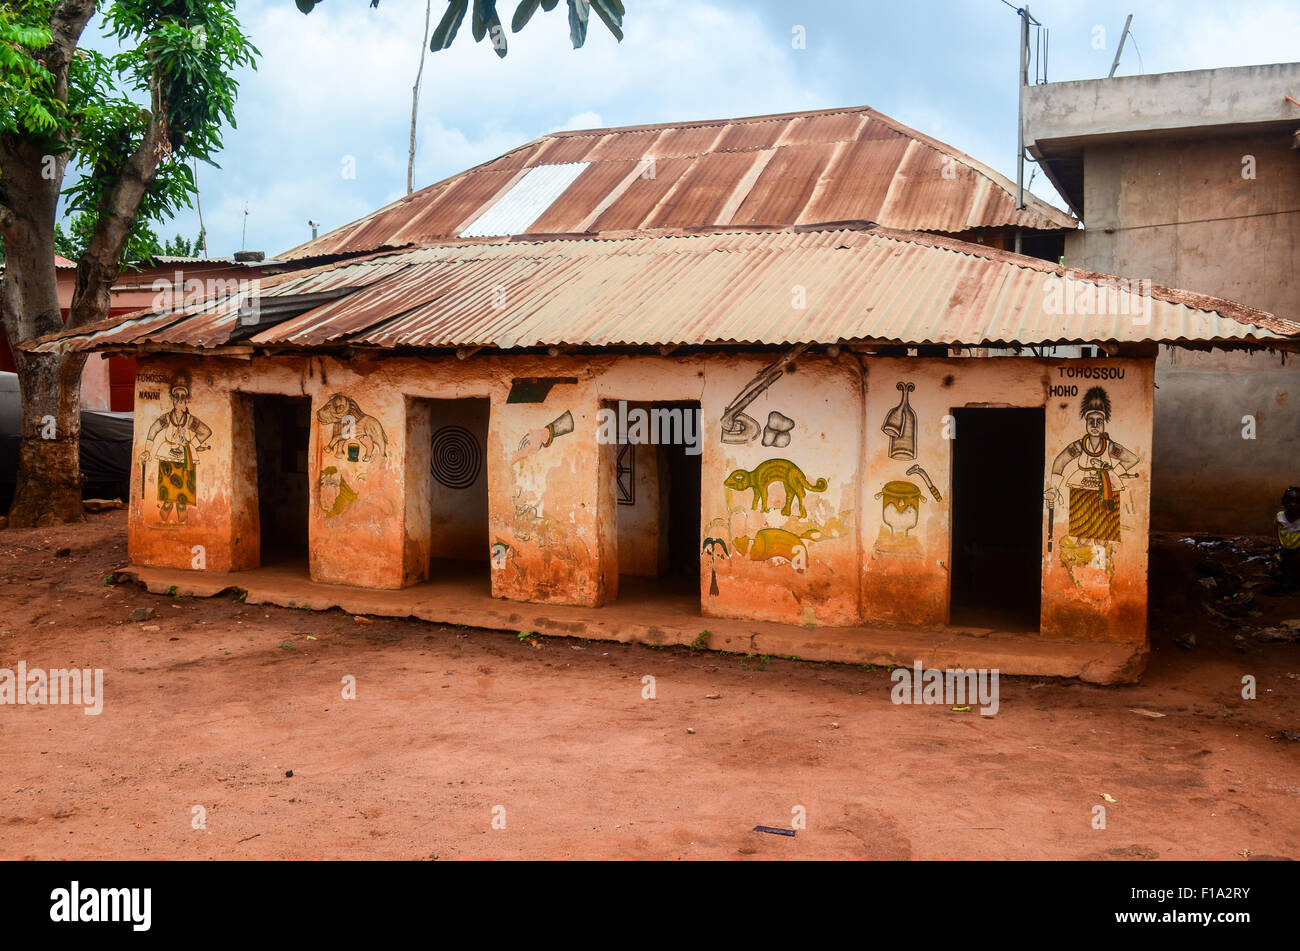 King palace in Abomey, Benin Stock Photo - Alamy